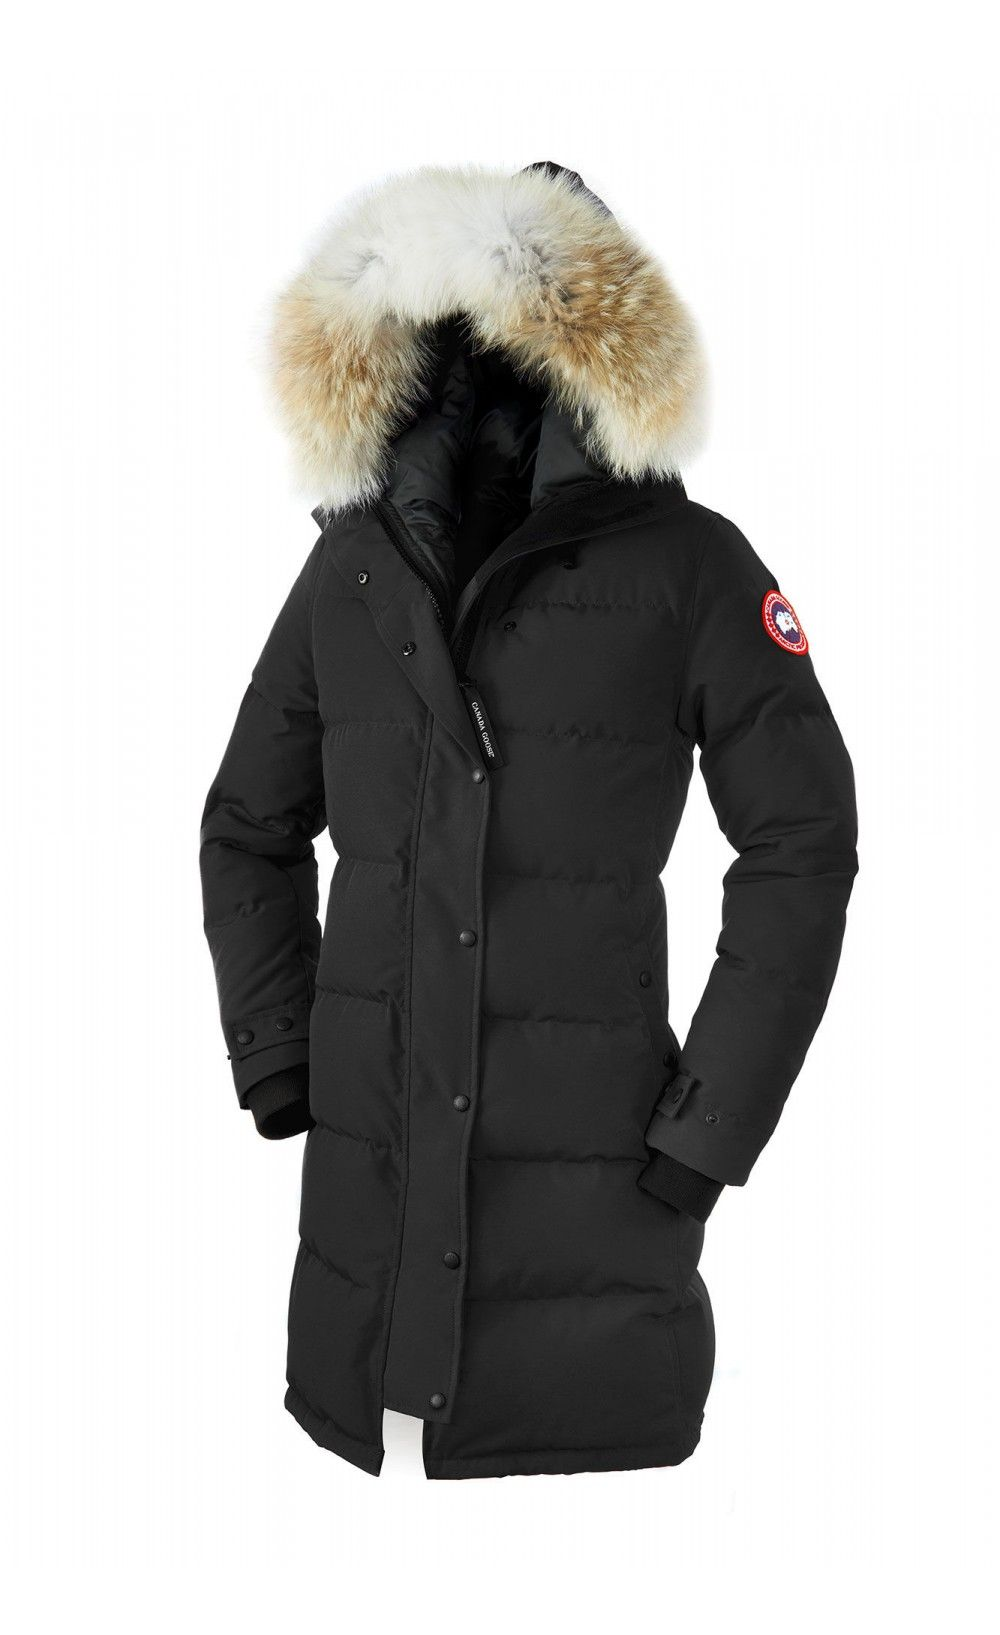 Canada Goose Shelburne Parka Black Women Canada Goose Women Fashion Canada Goose Jackets